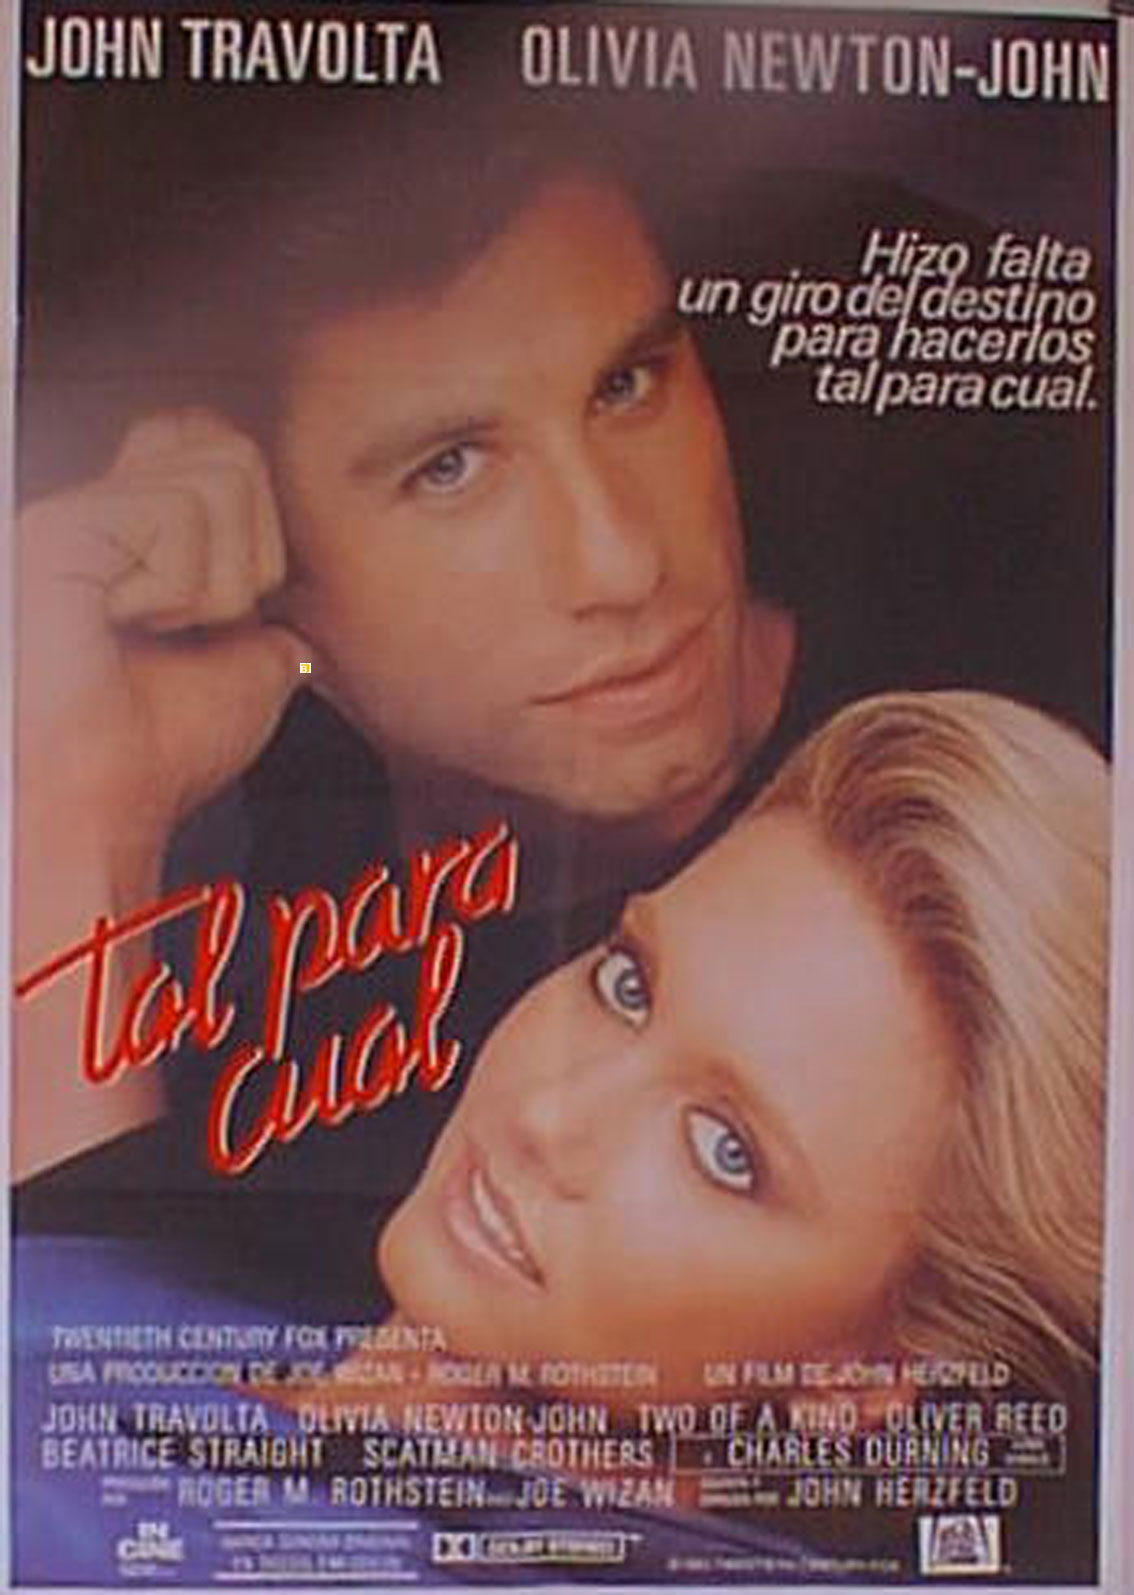 Two of the kind John Travolta vintage movie poster